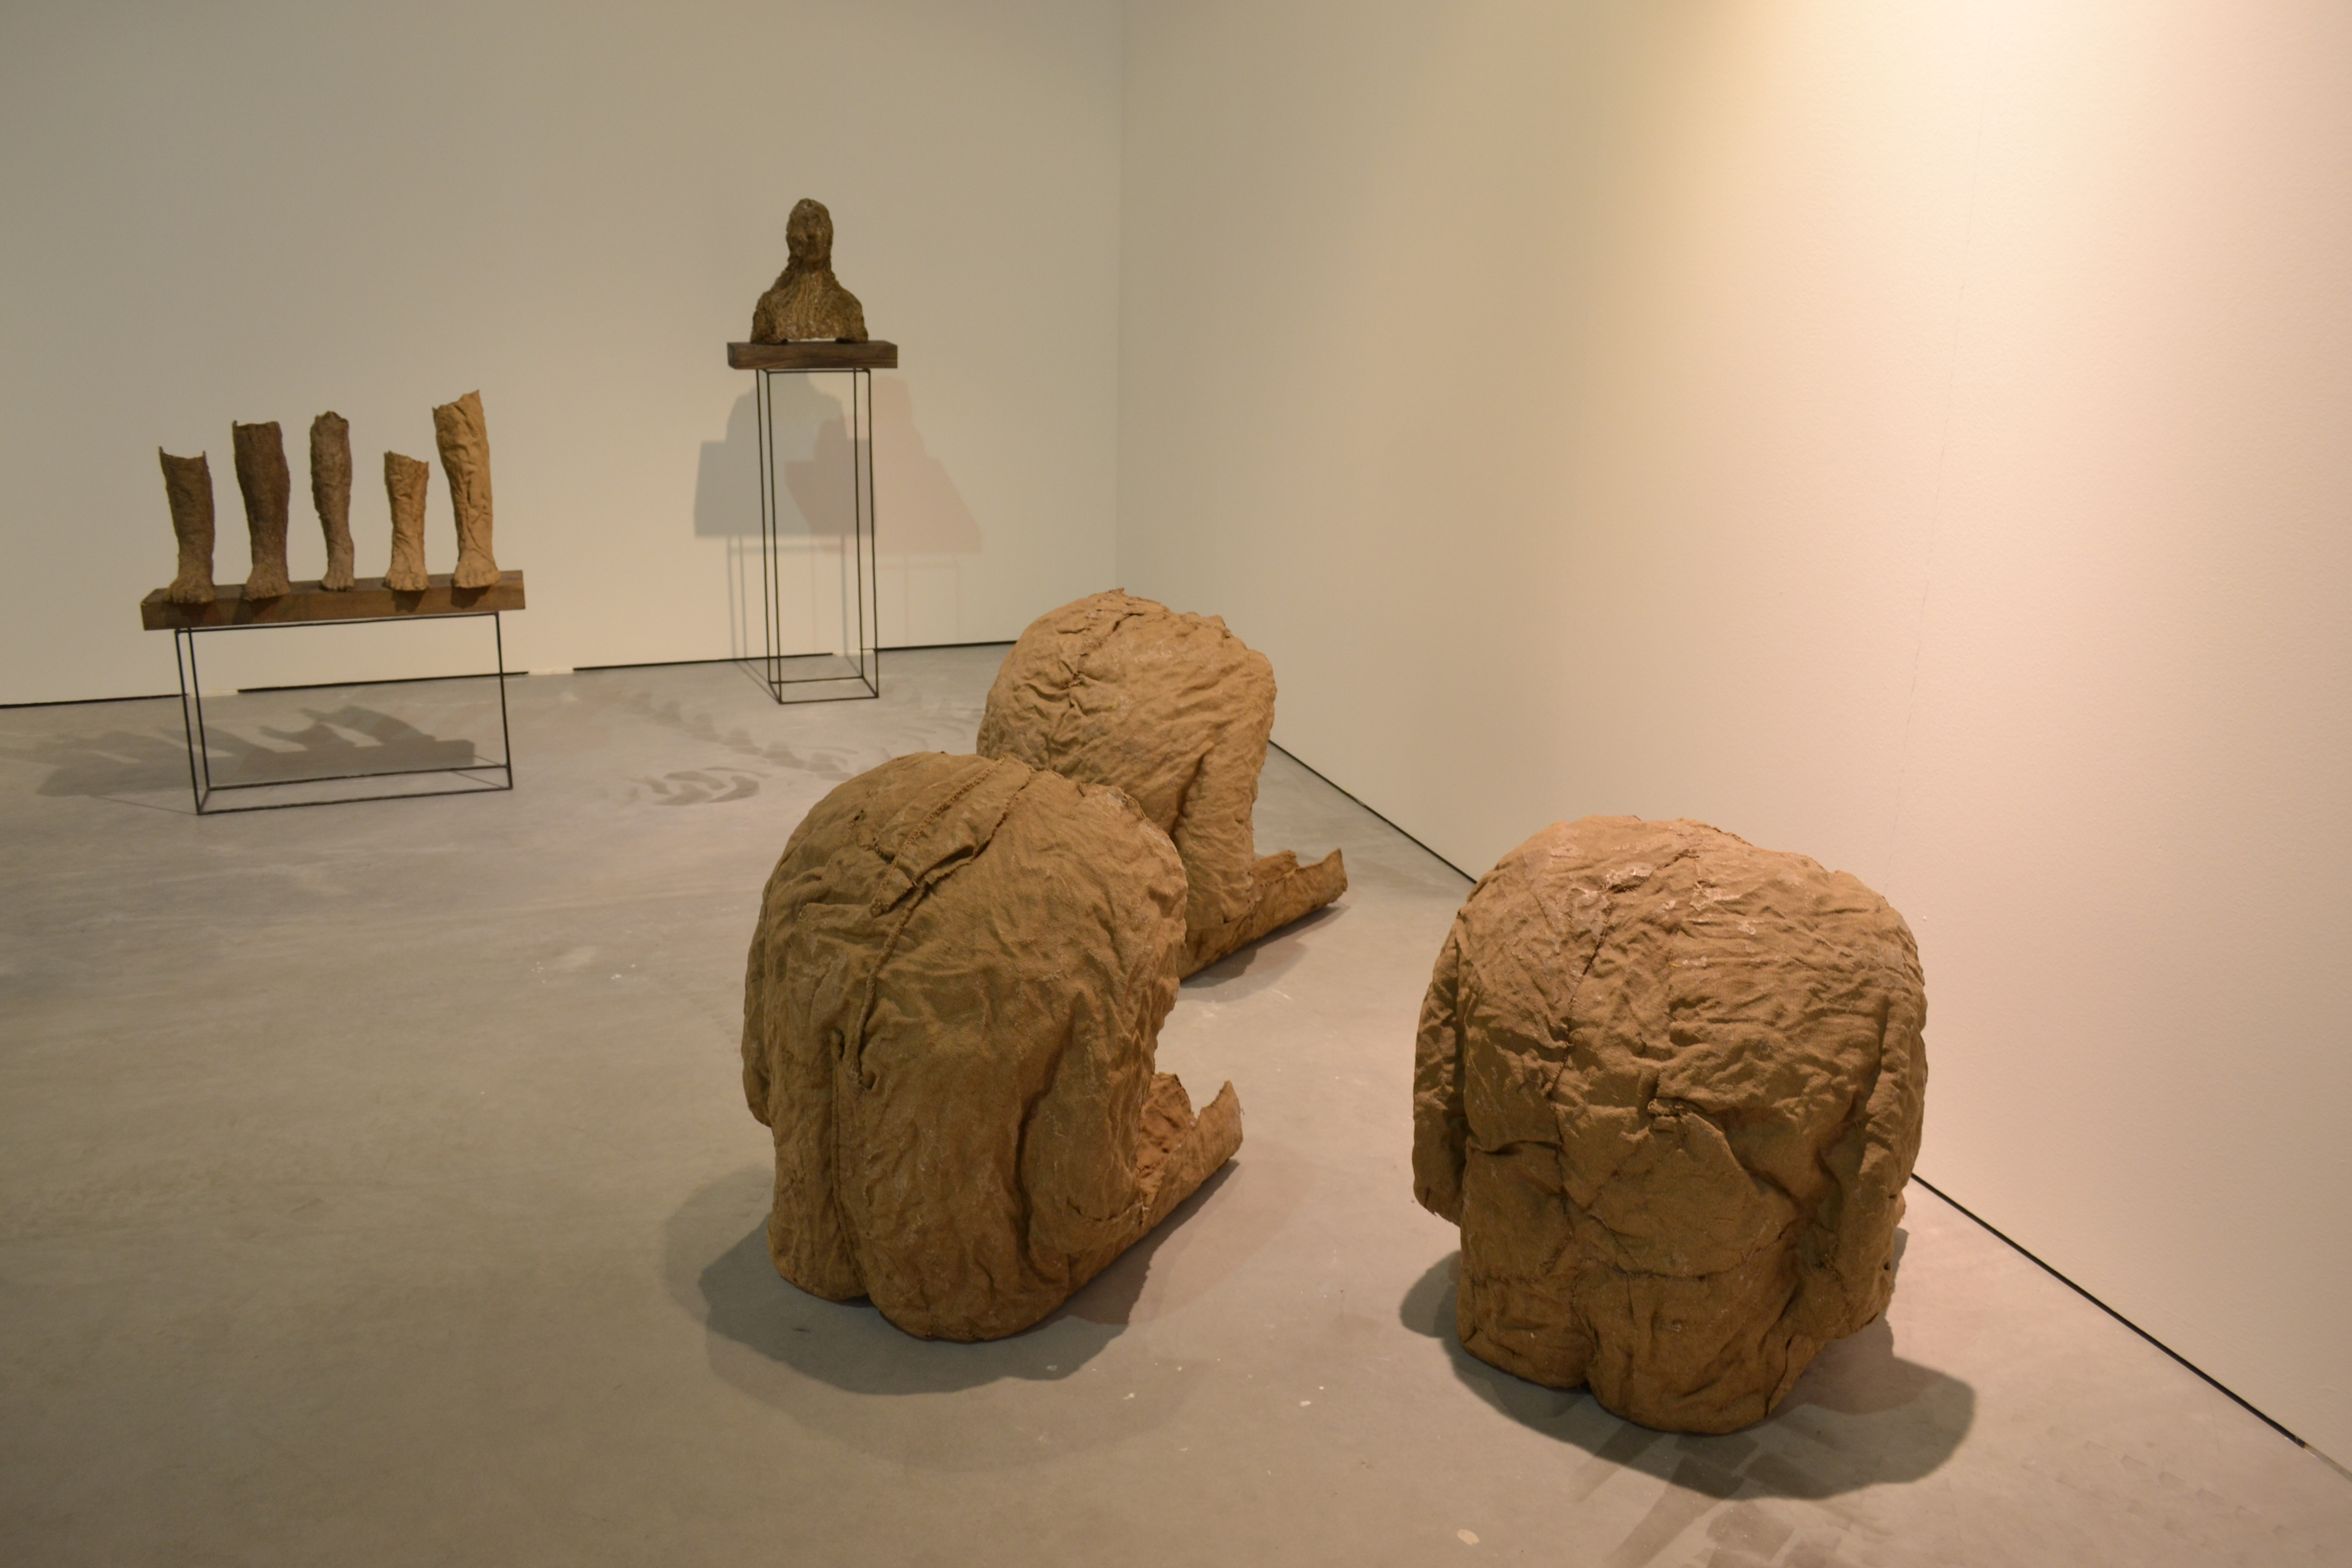 Galeria ŻAK BRANICKA, prace Magdaleny Abakanowicz